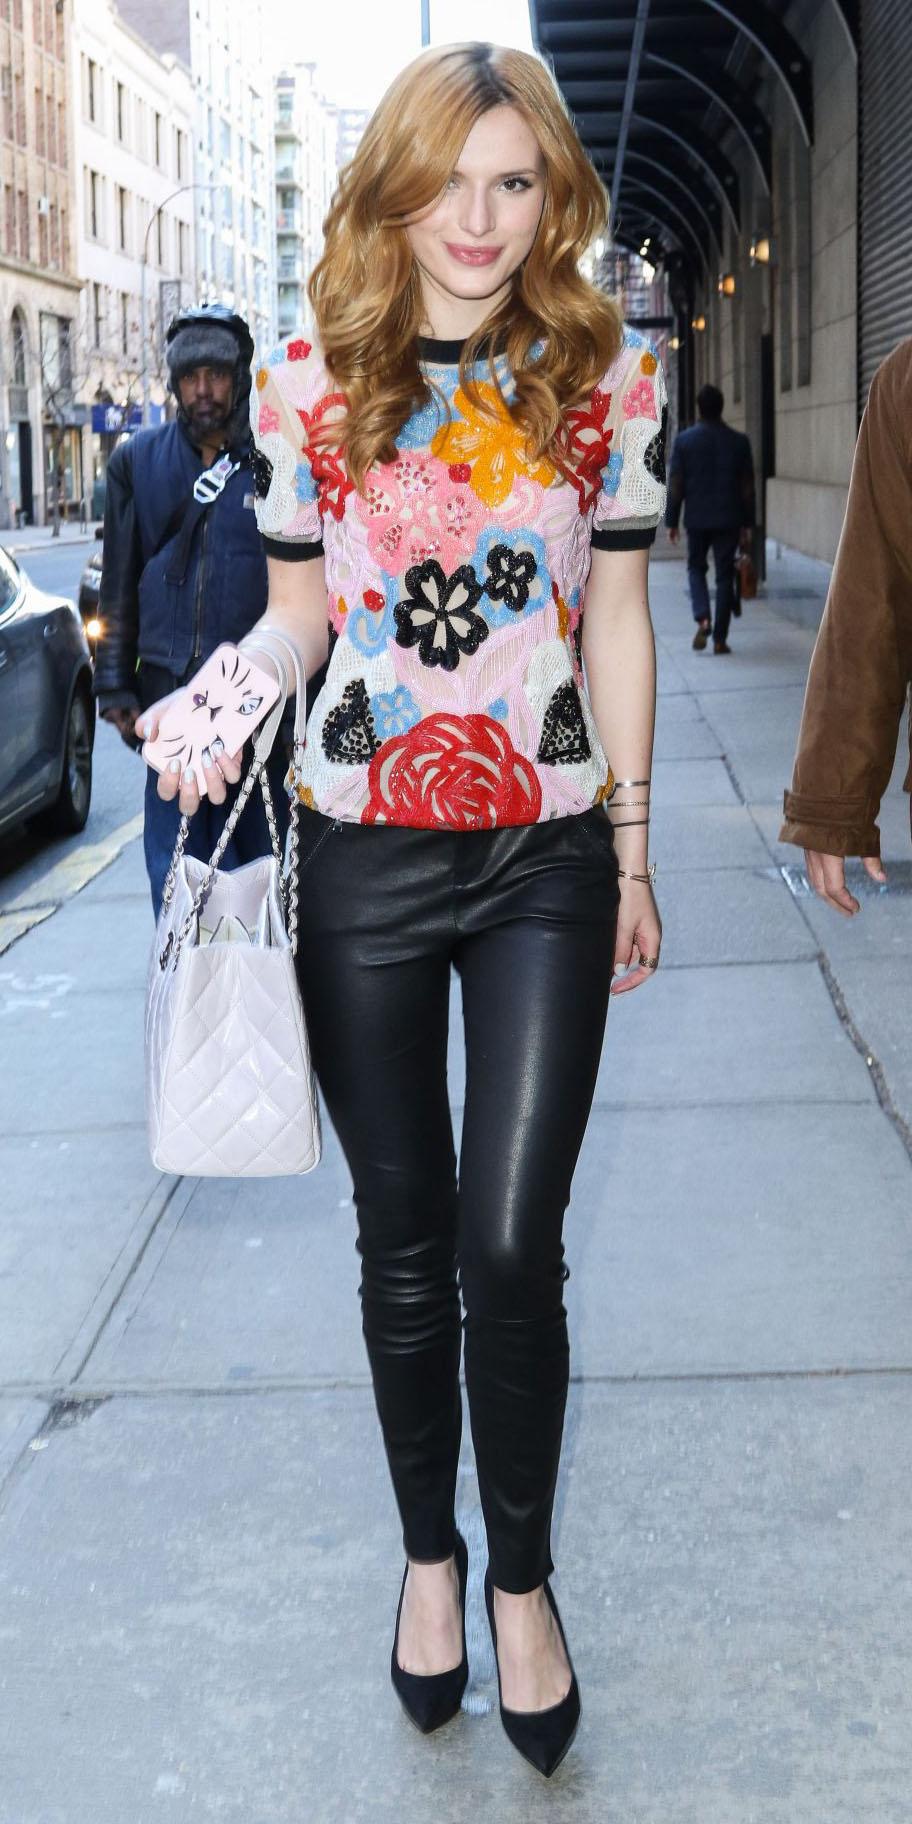 black-slim-pants-red-top-white-bag-black-shoe-pumps-spring-summer-howtowear-floral-bellathorne-leather-hairr-lunch.jpg